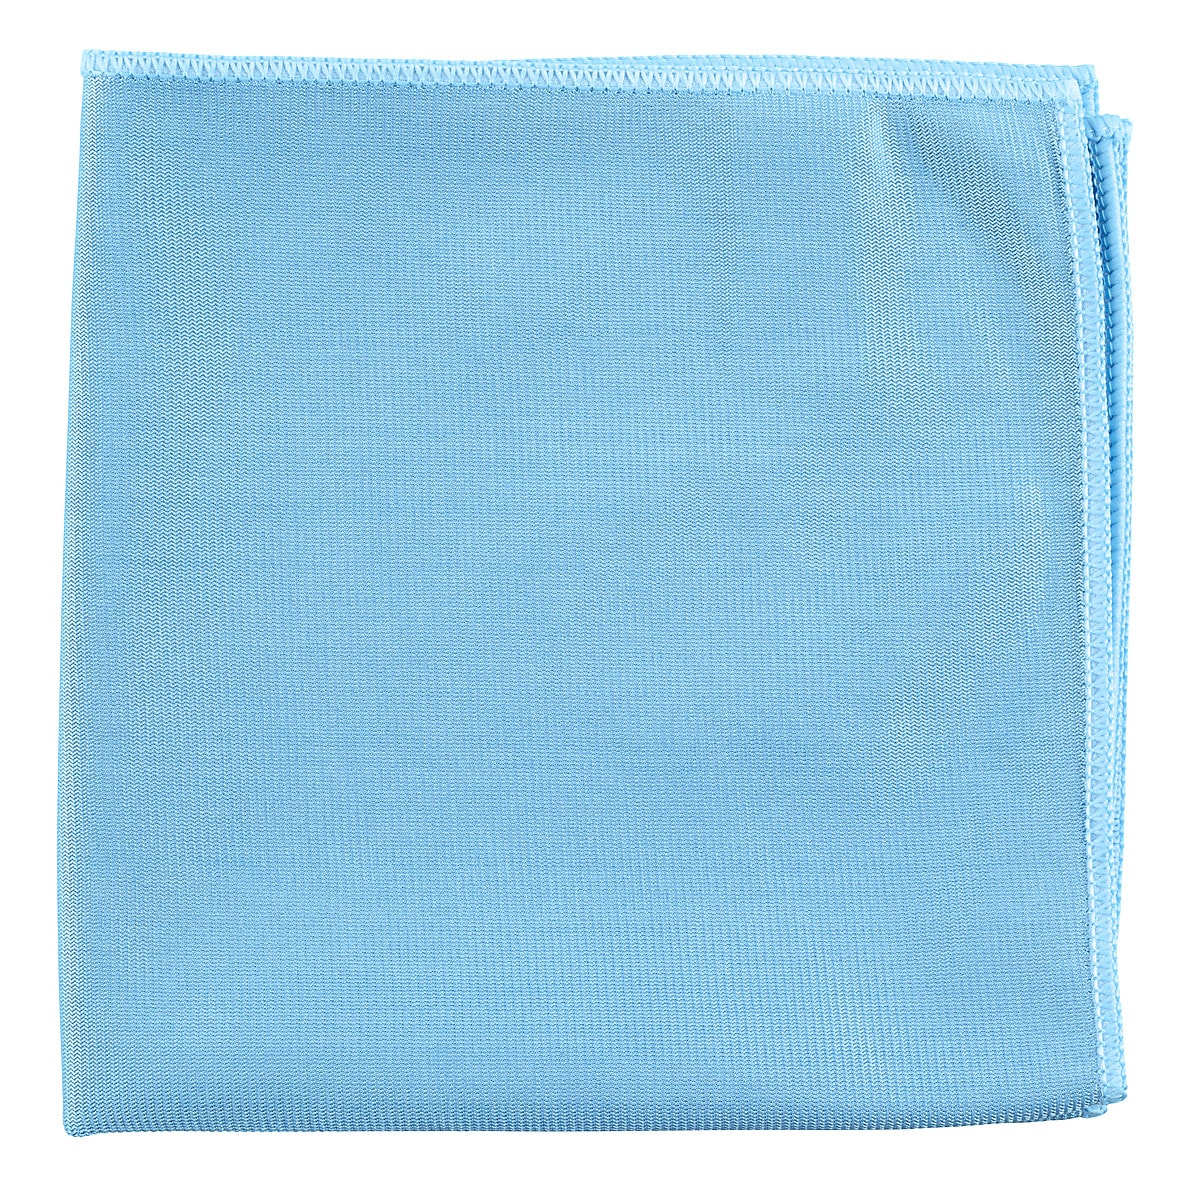 Städpaket Smart Microfiber